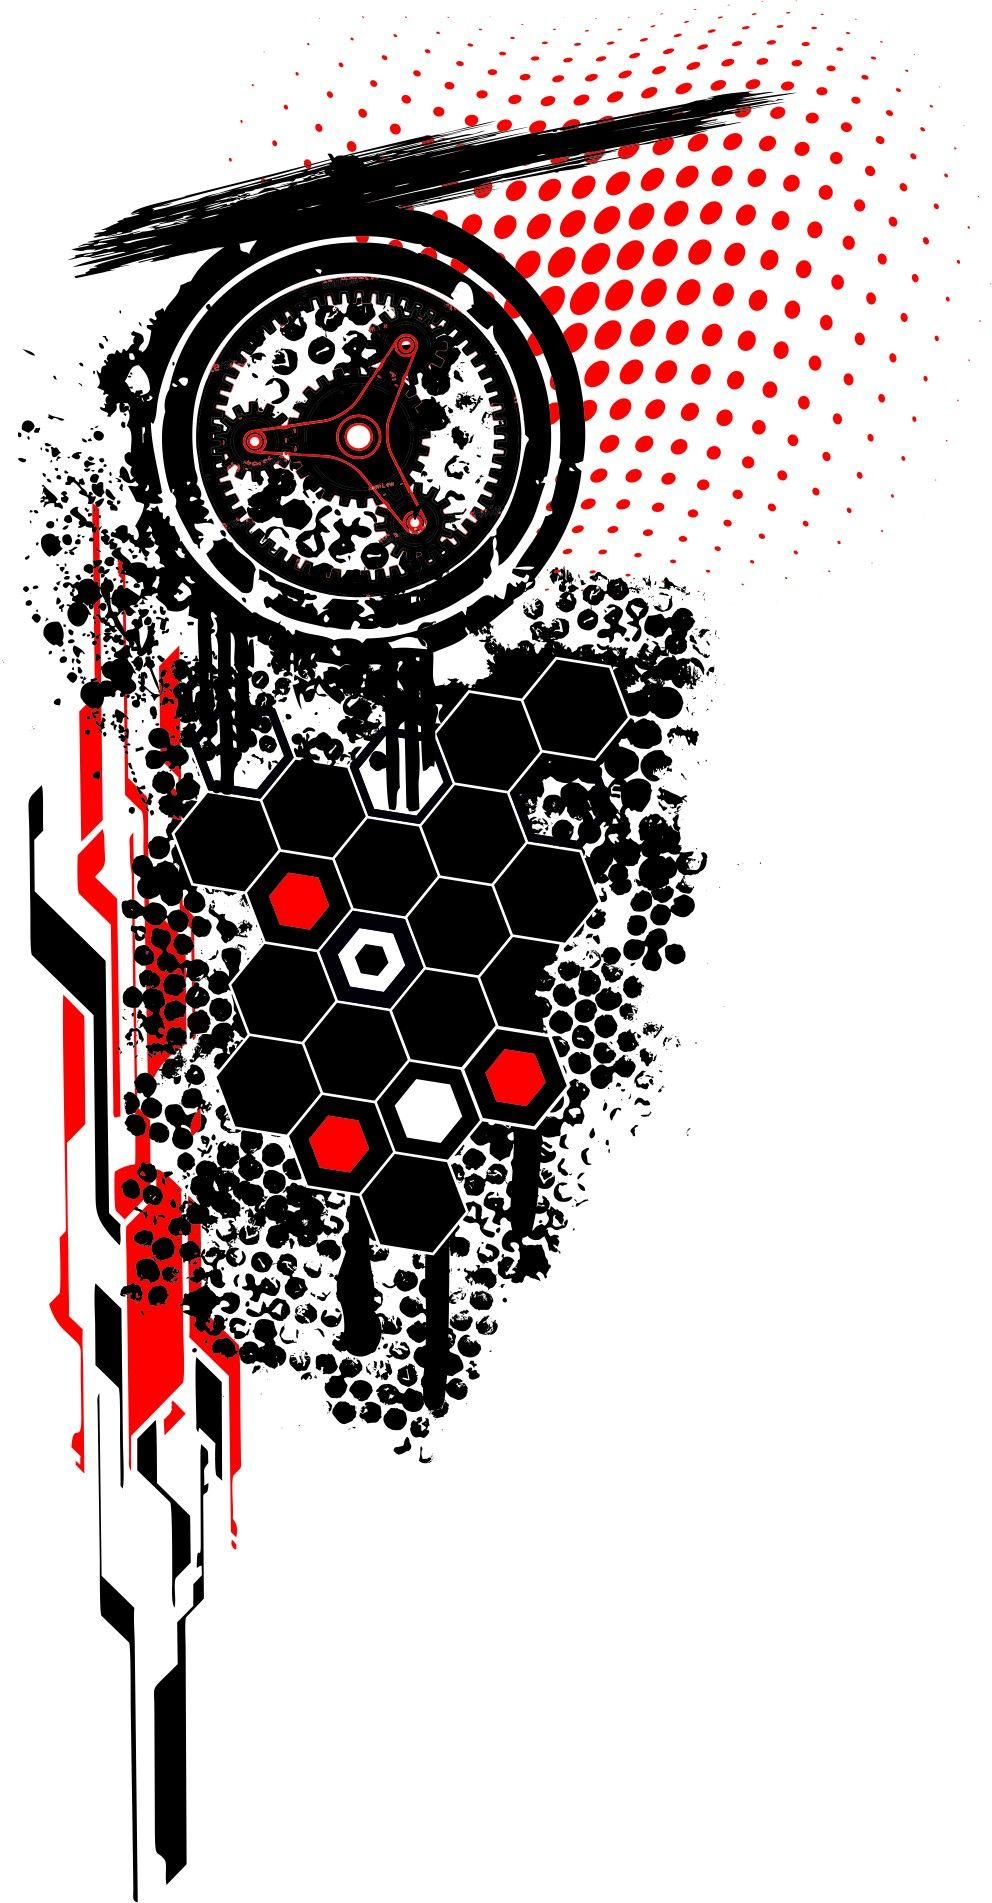 Trash Hexagon Polka Tattoo Trash Trash Polka Tattoo Trash Polka Tattoo Designs